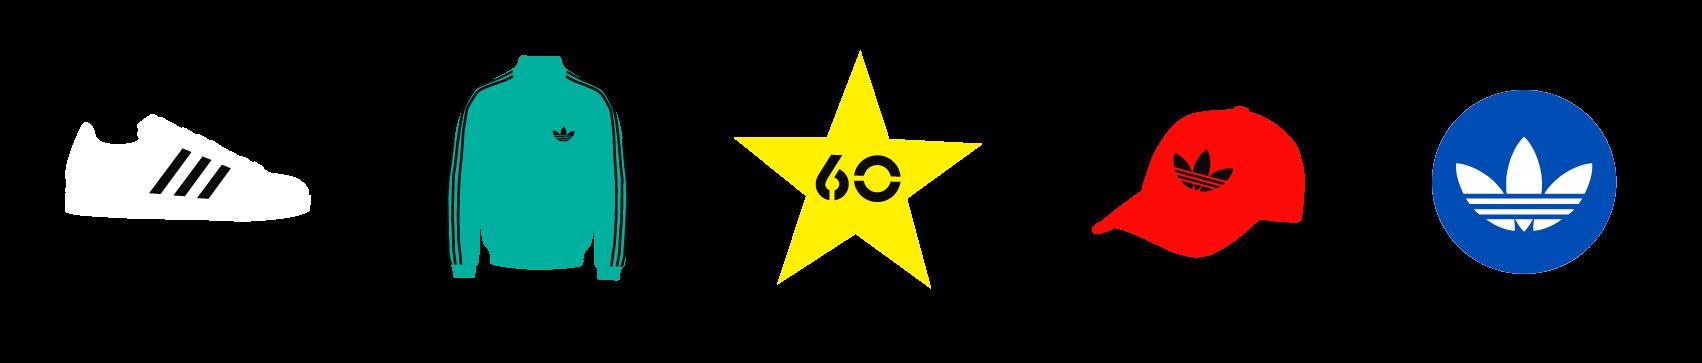 Adidas-60-icons